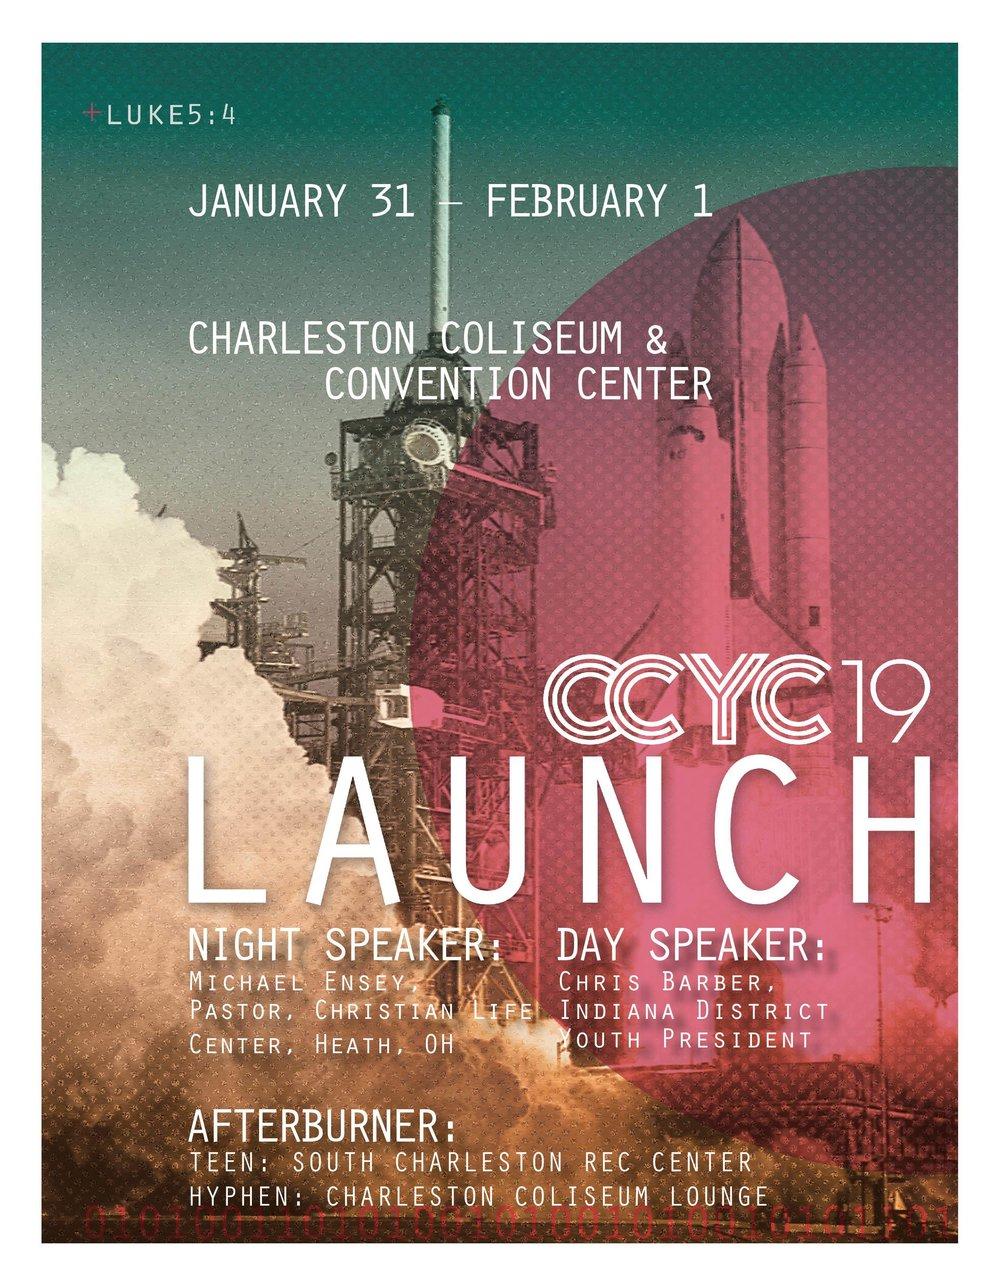 CCYC 2019 Flyer.JPG